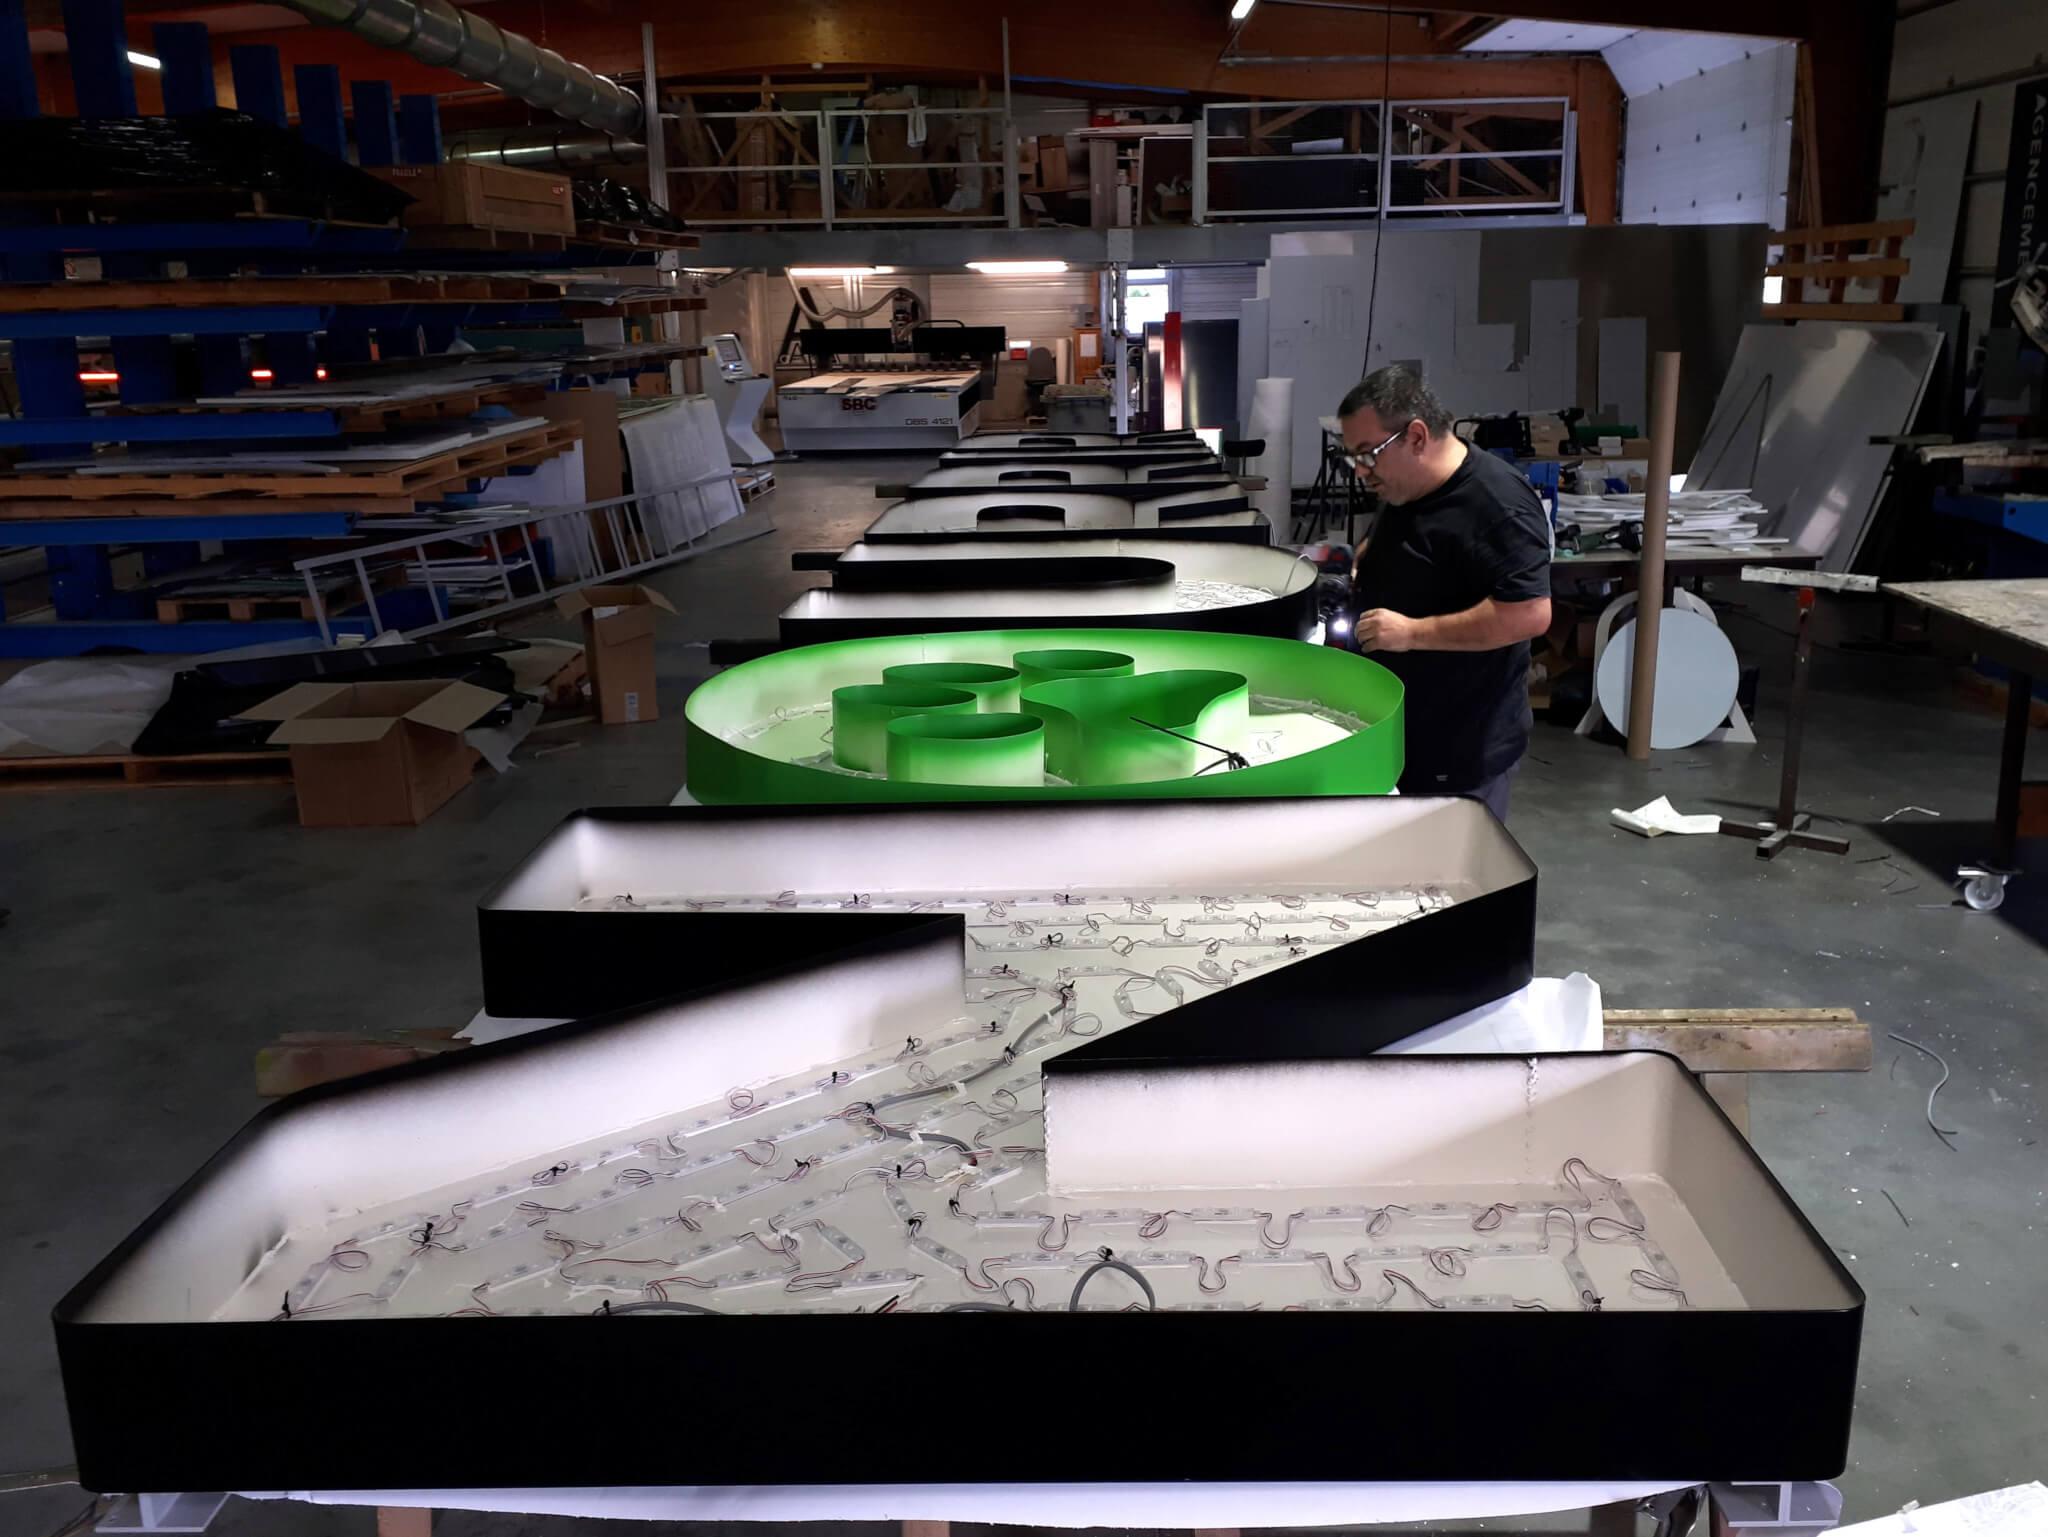 Fabrication Enseignes lumineuses à led -SES Grigny -Lyon